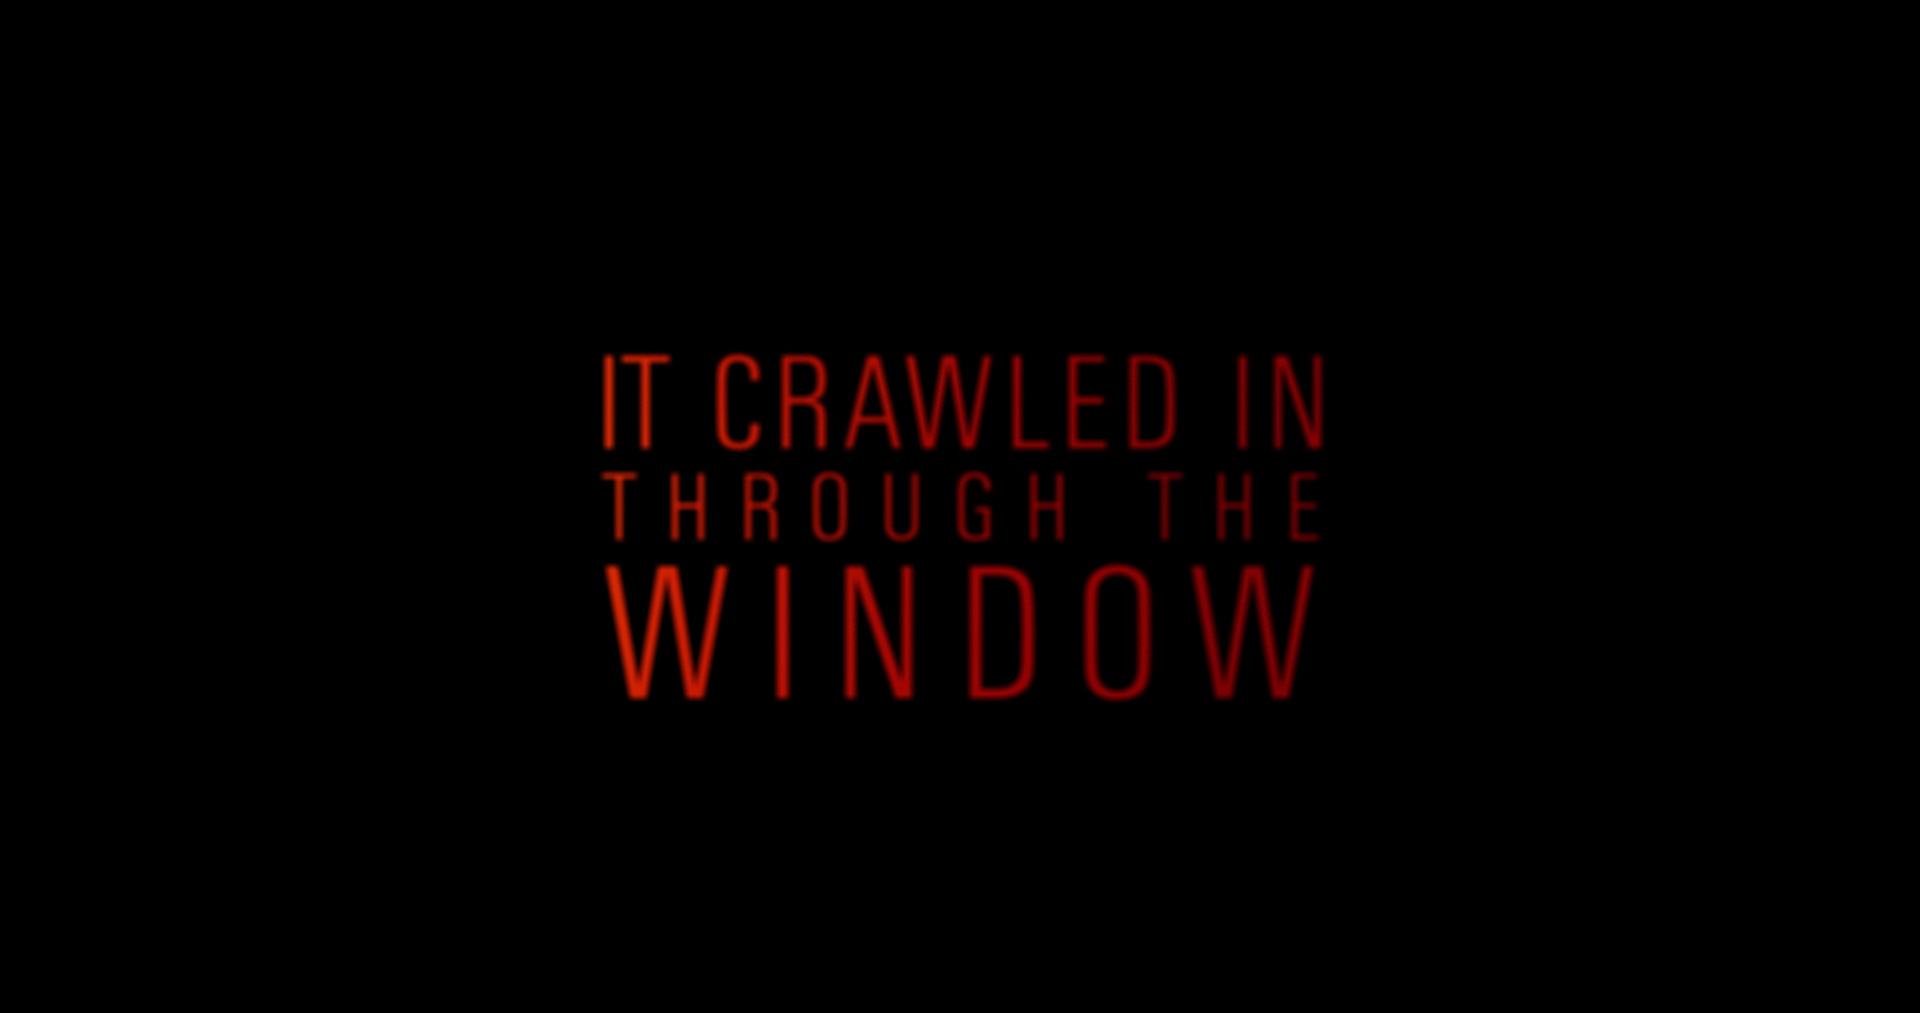 ItCrawledInThroughTheWindow_Master_1080LT_THUMB.jpg